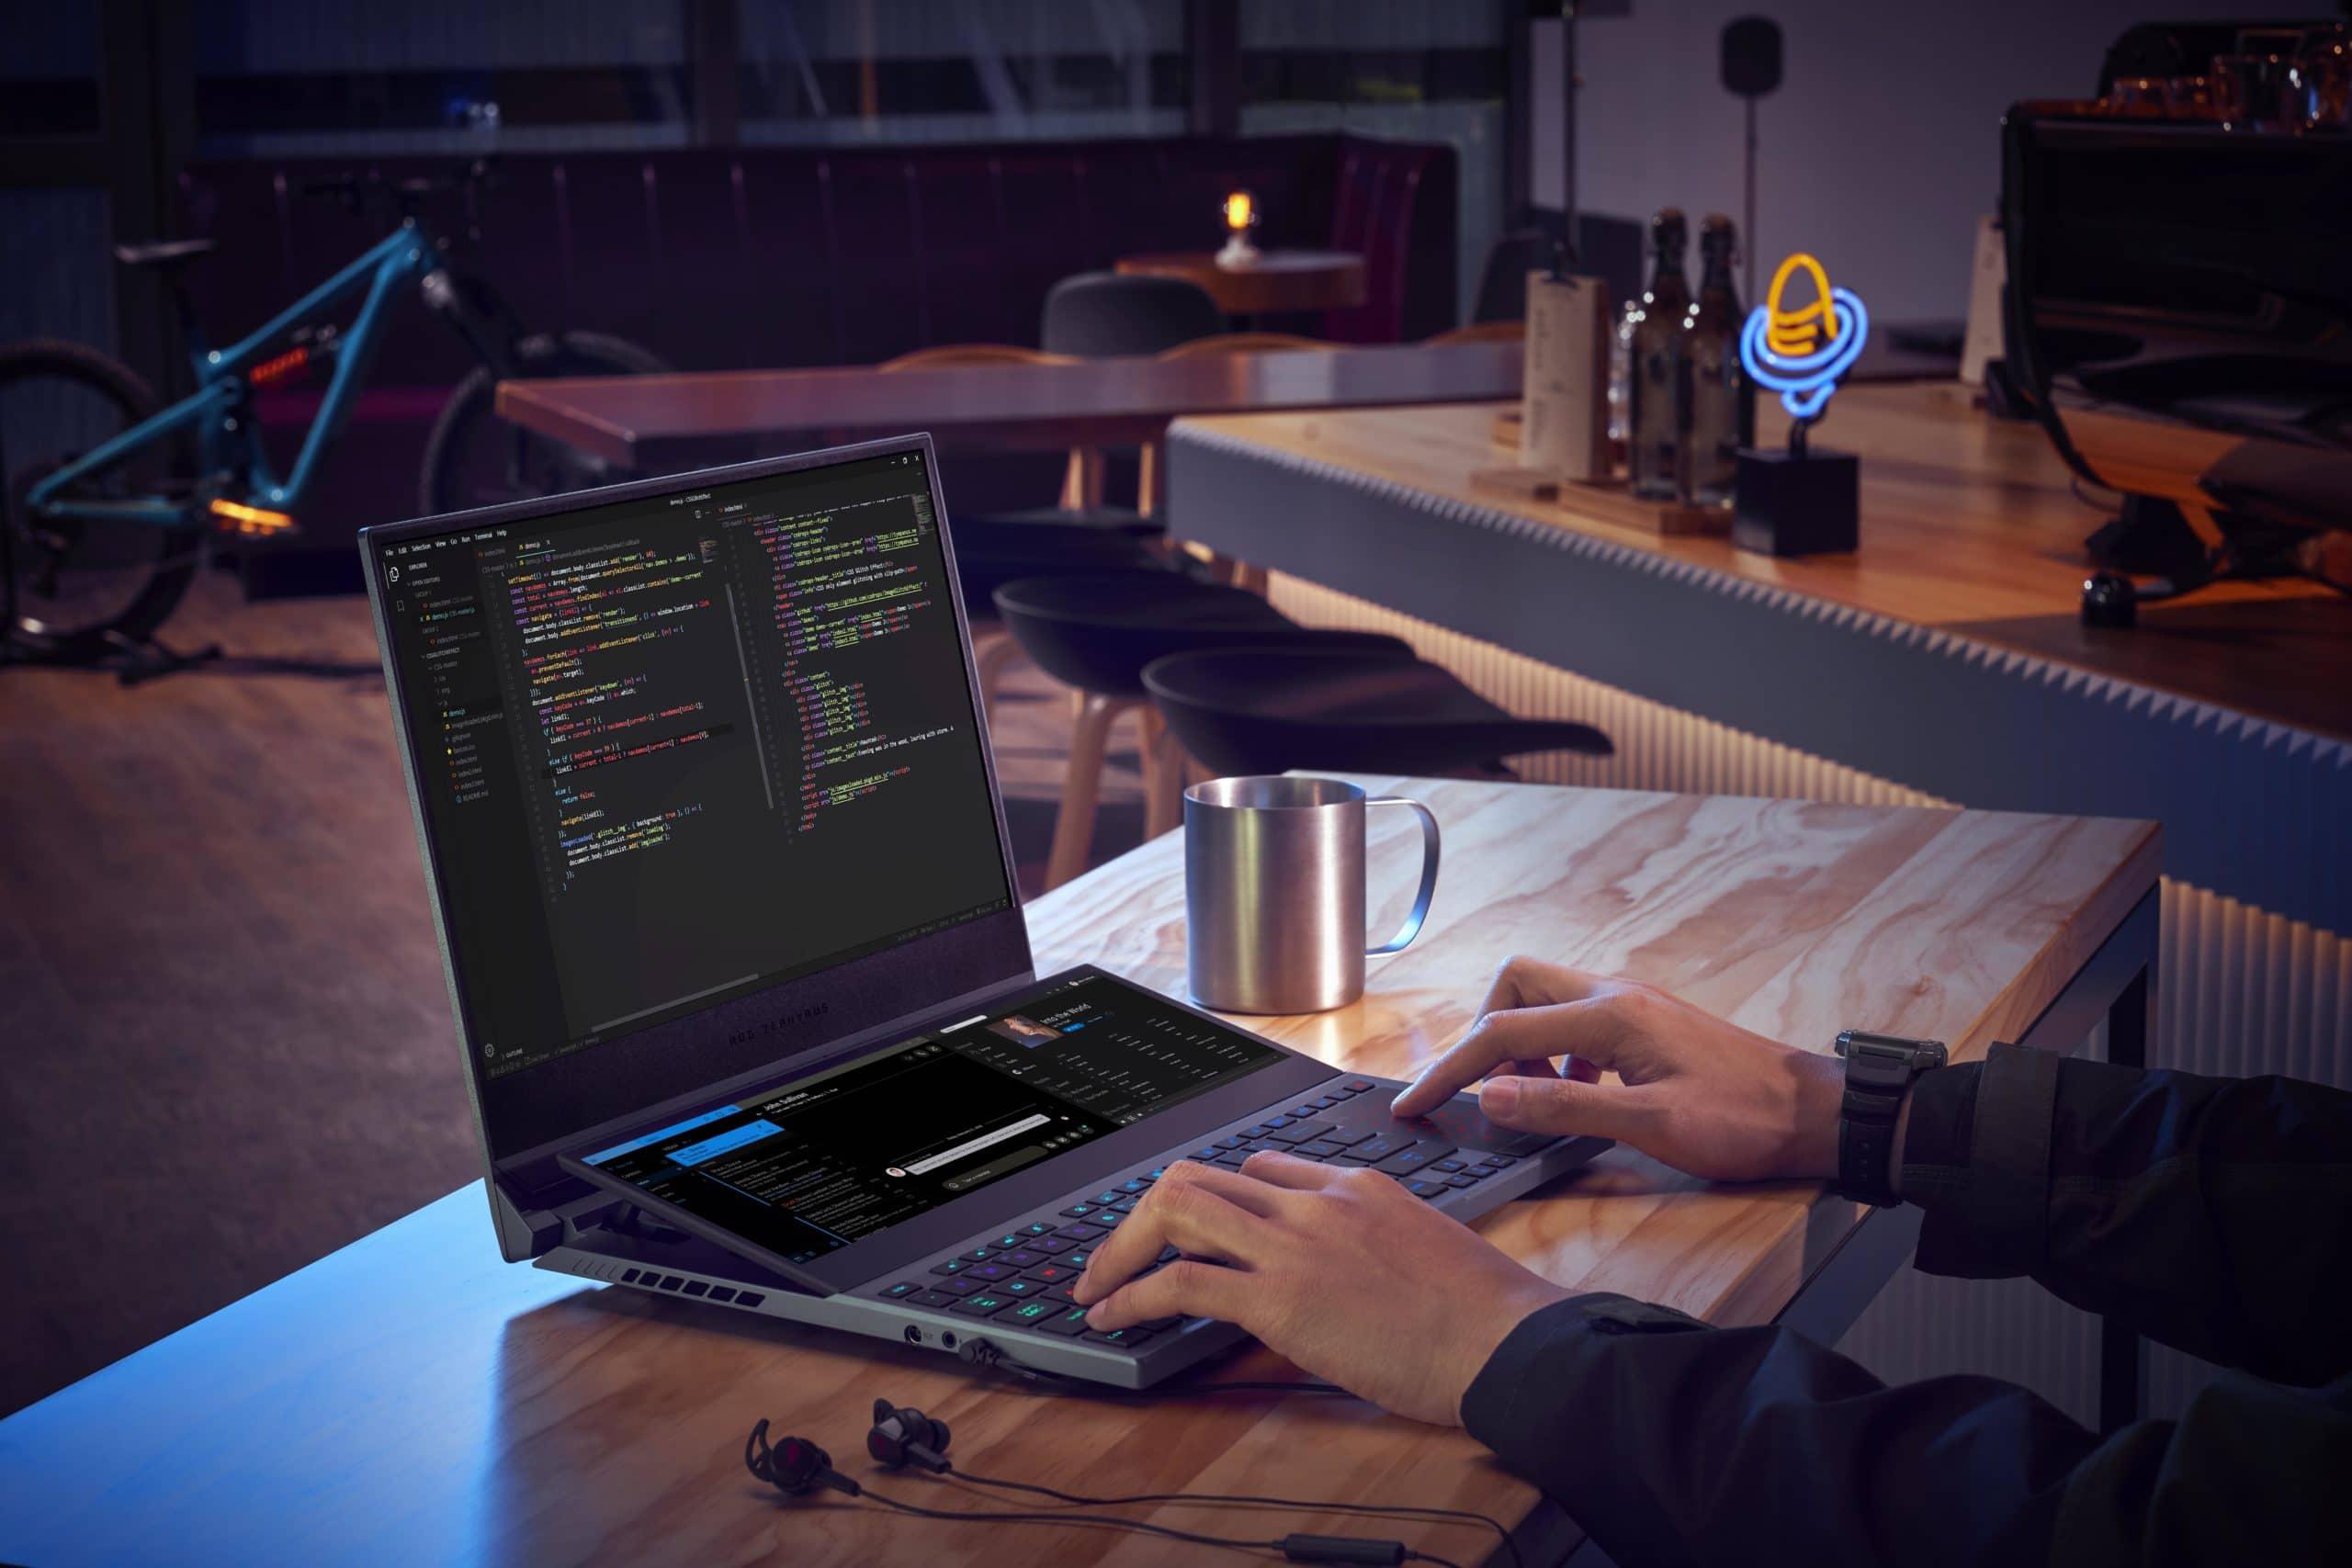 ROG Zephyrus Duo 15: Zwei Bildschirme, mehr Produktivität?